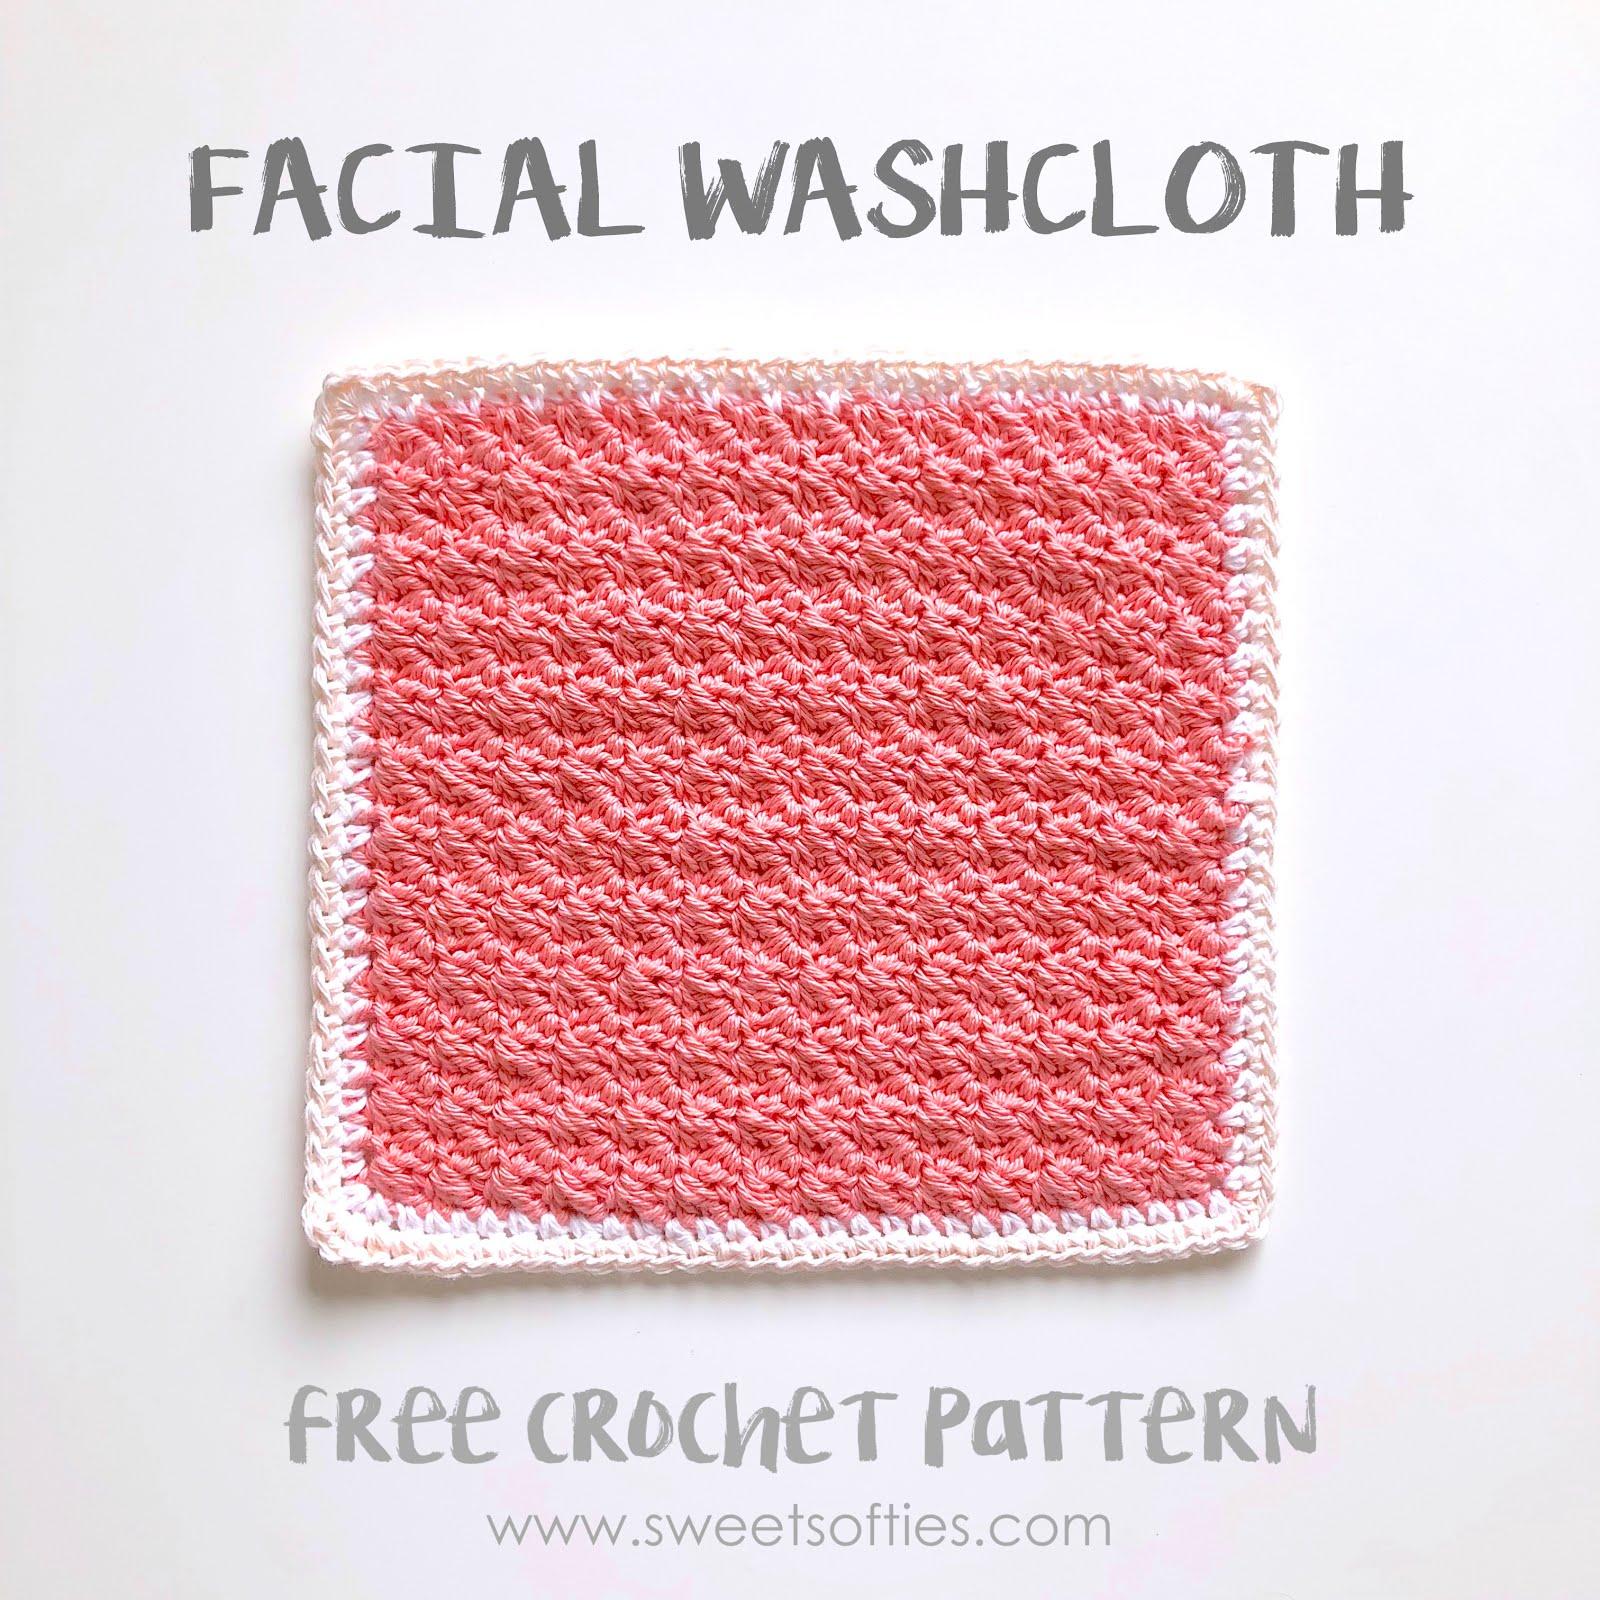 Facial Washcloth Free Crochet Pattern Tea Rose Spa Set Part 4